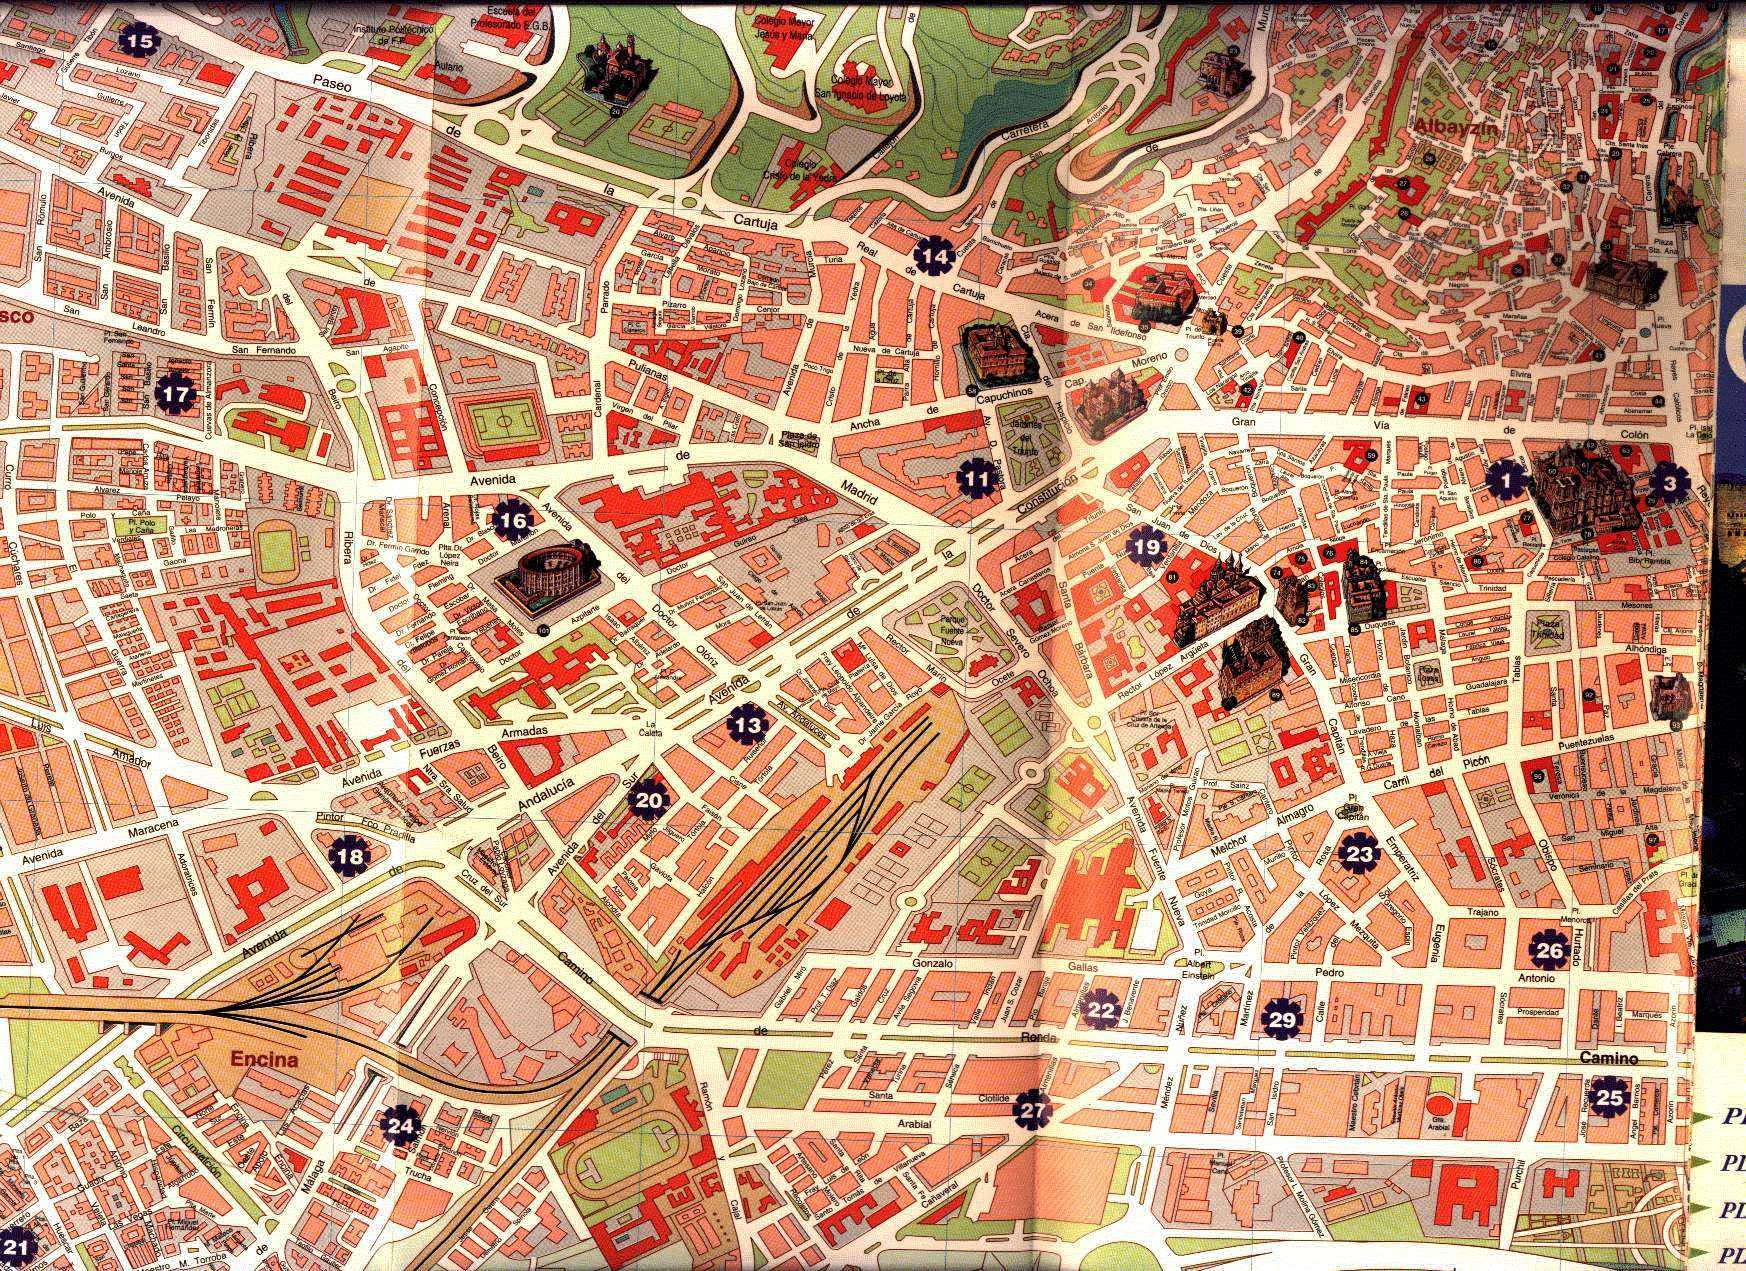 Advertisement granada sightseeing map Full HD